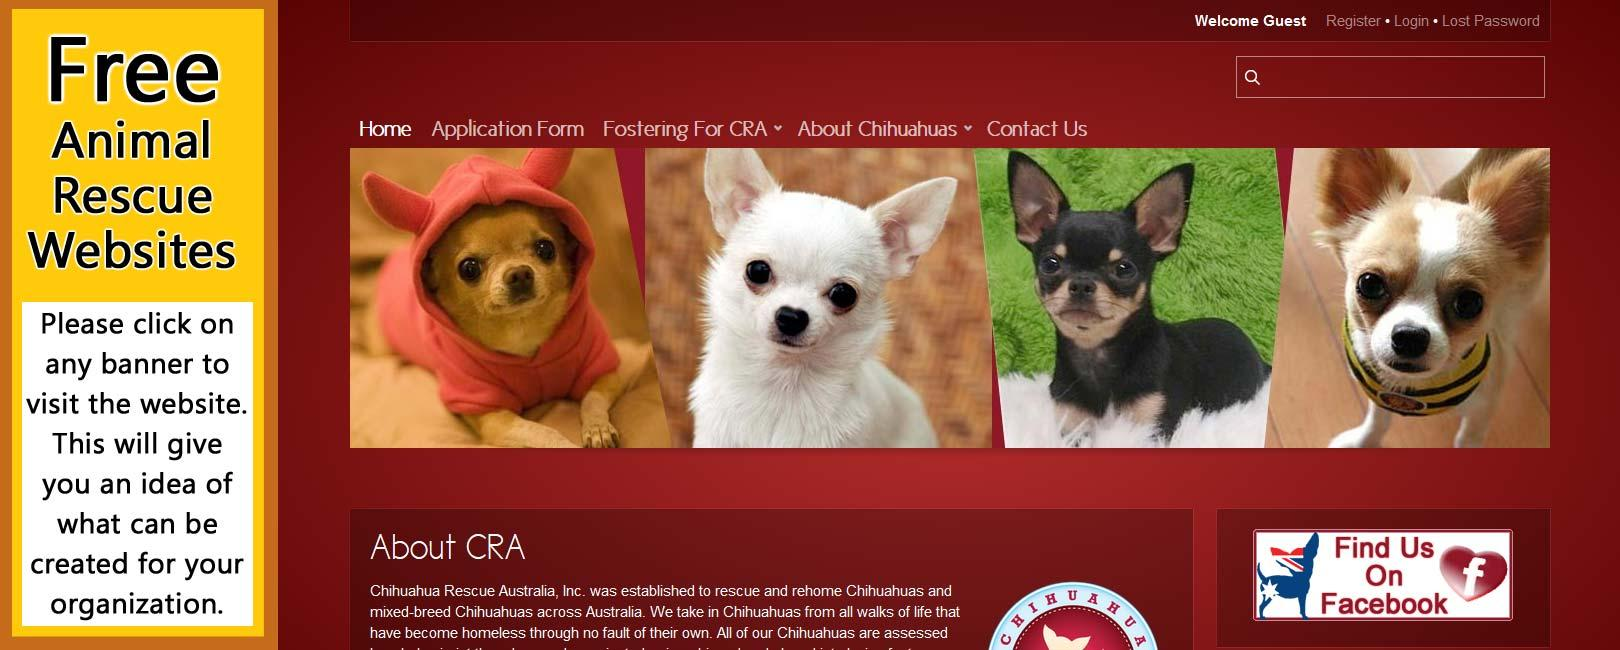 Wel e To Free Animal Rescue Websites